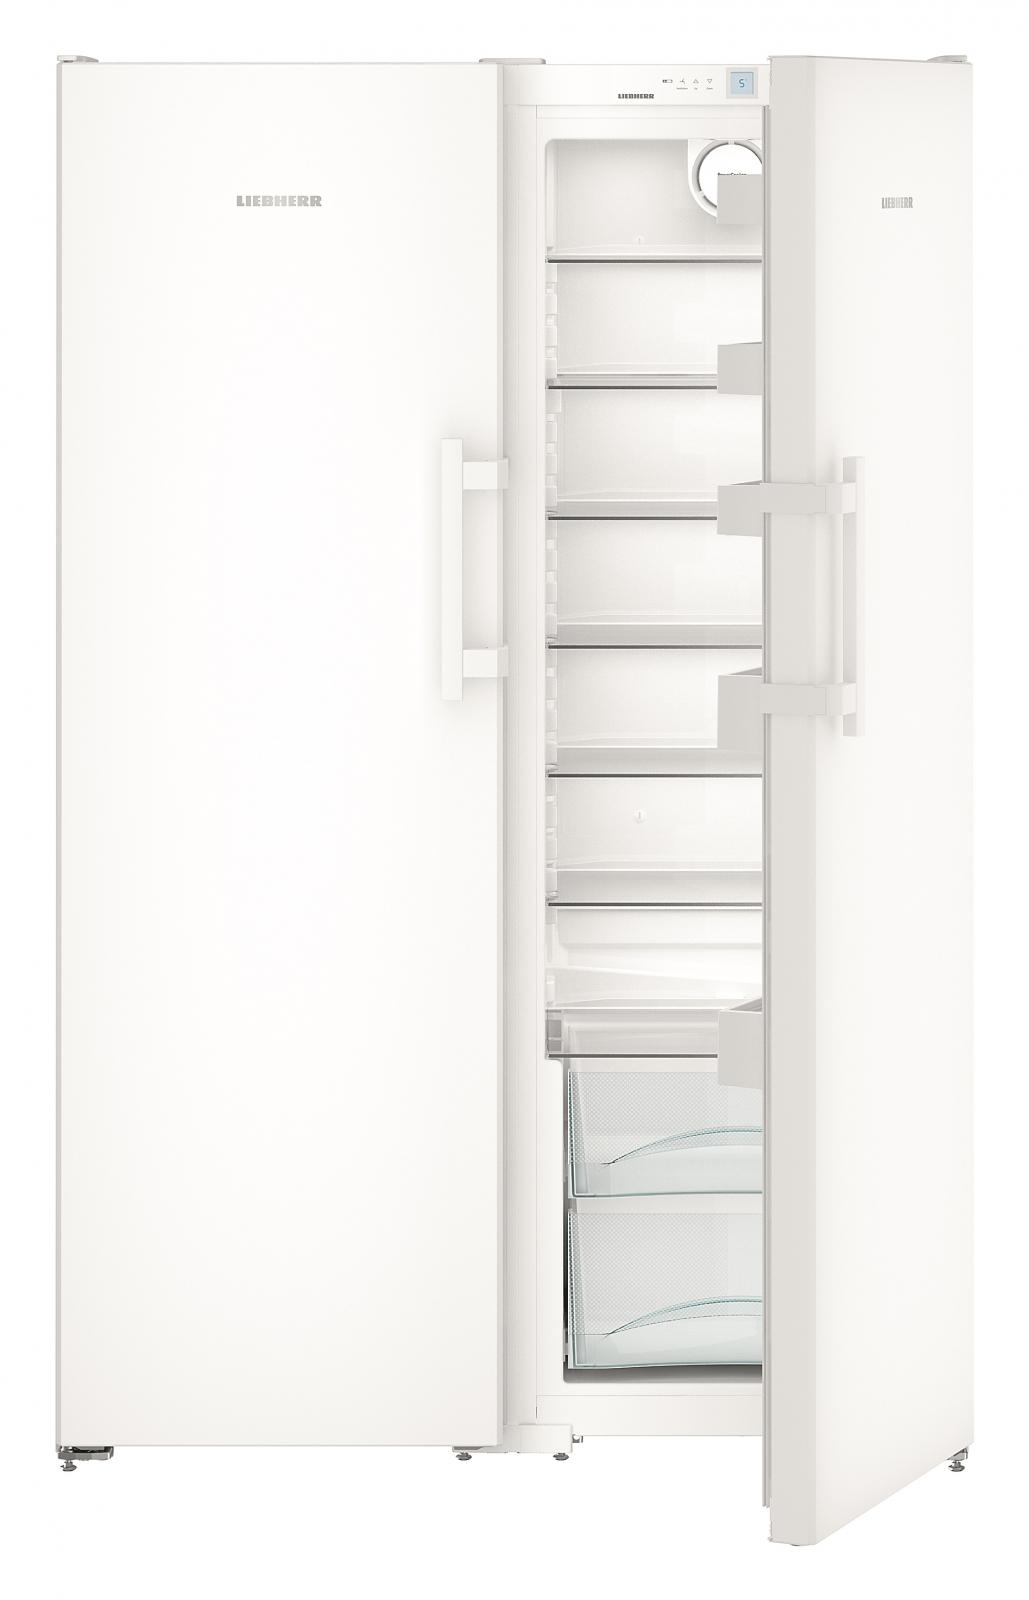 купить Side-by-side холодильник Liebherr SBS 7242 Украина фото 4